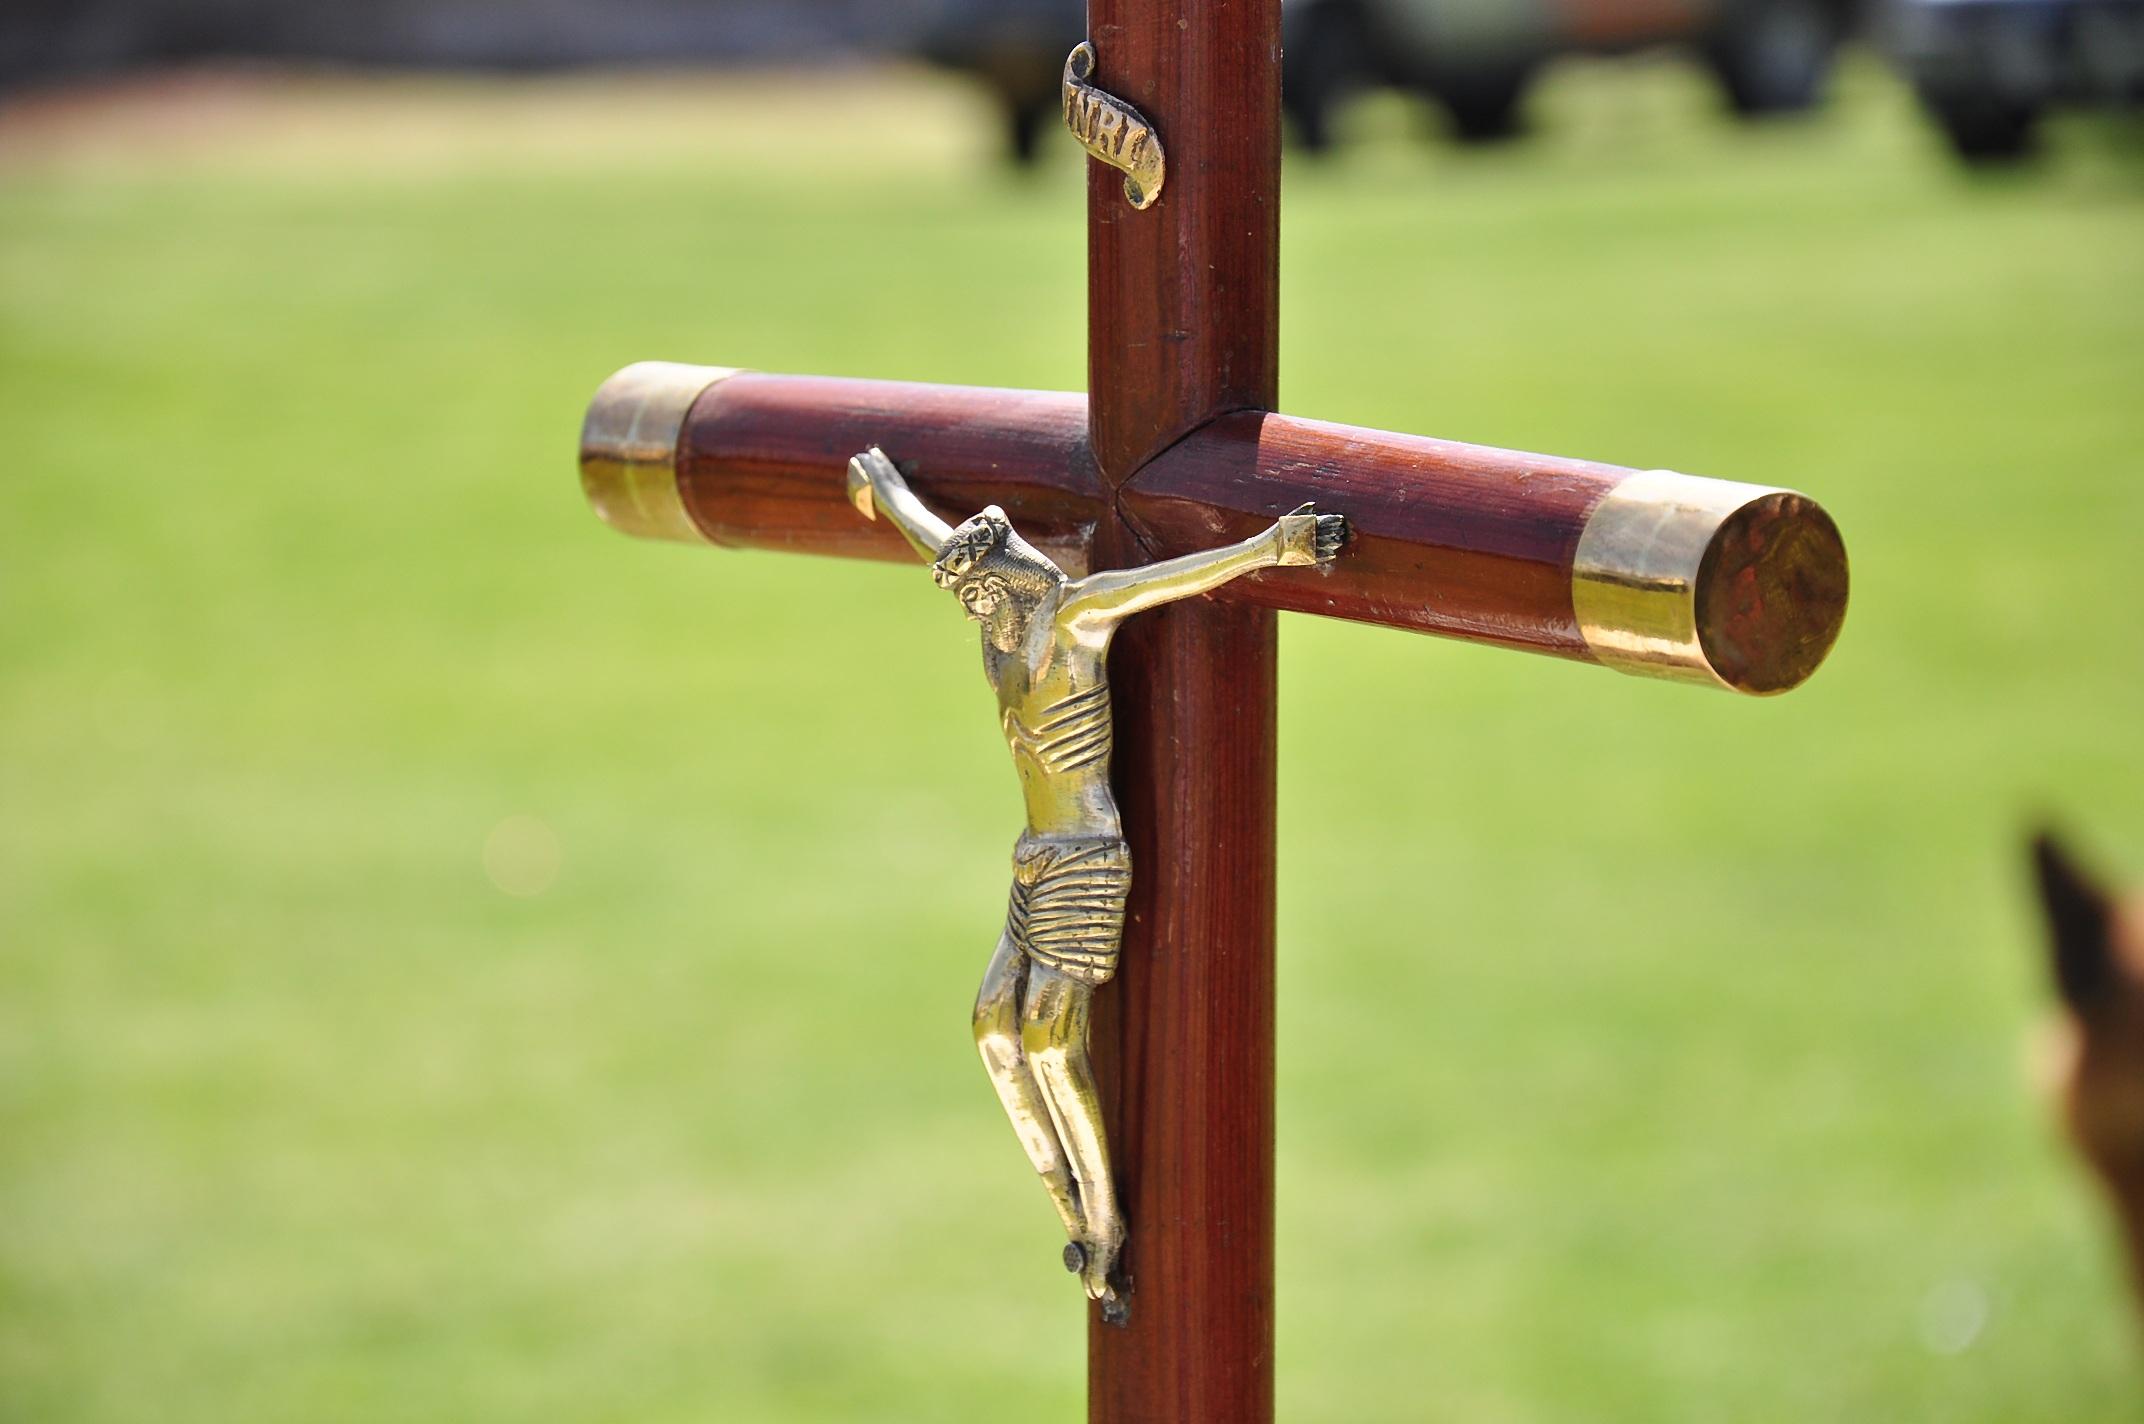 Beautiful Iphone 5 Wallpapers Free Stock Photo Of Catholic Christ Crucifix